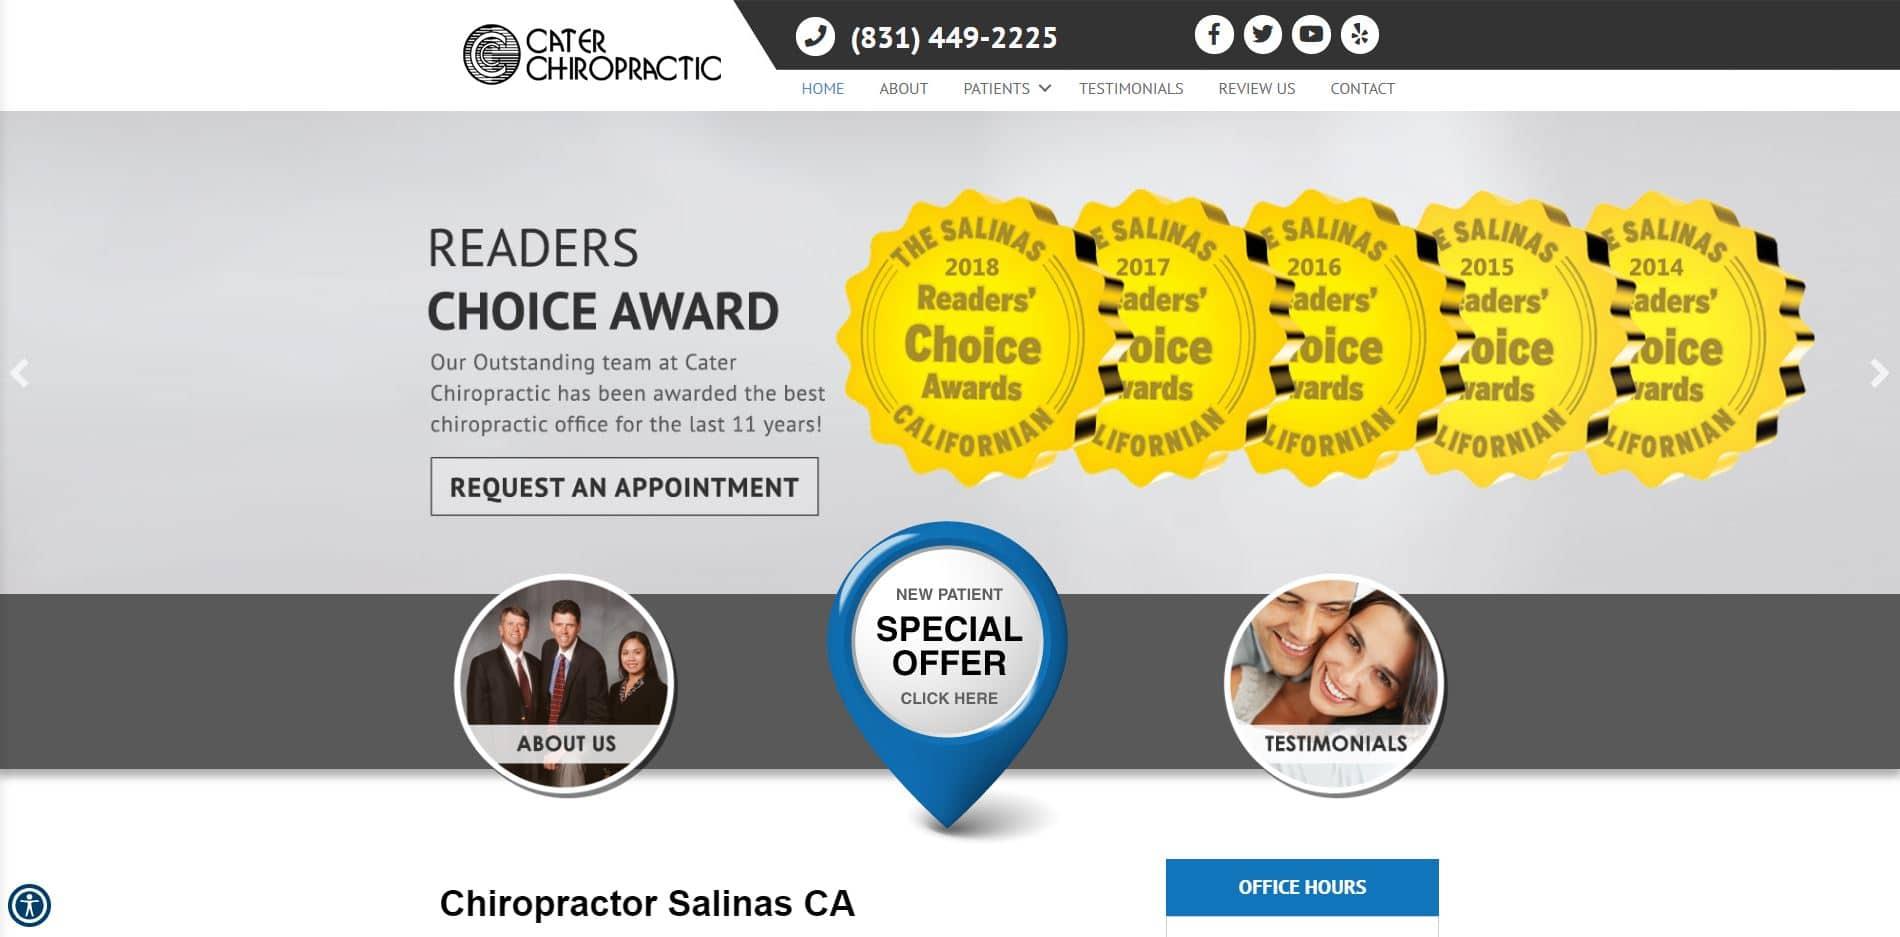 Chiropractor in Salinas